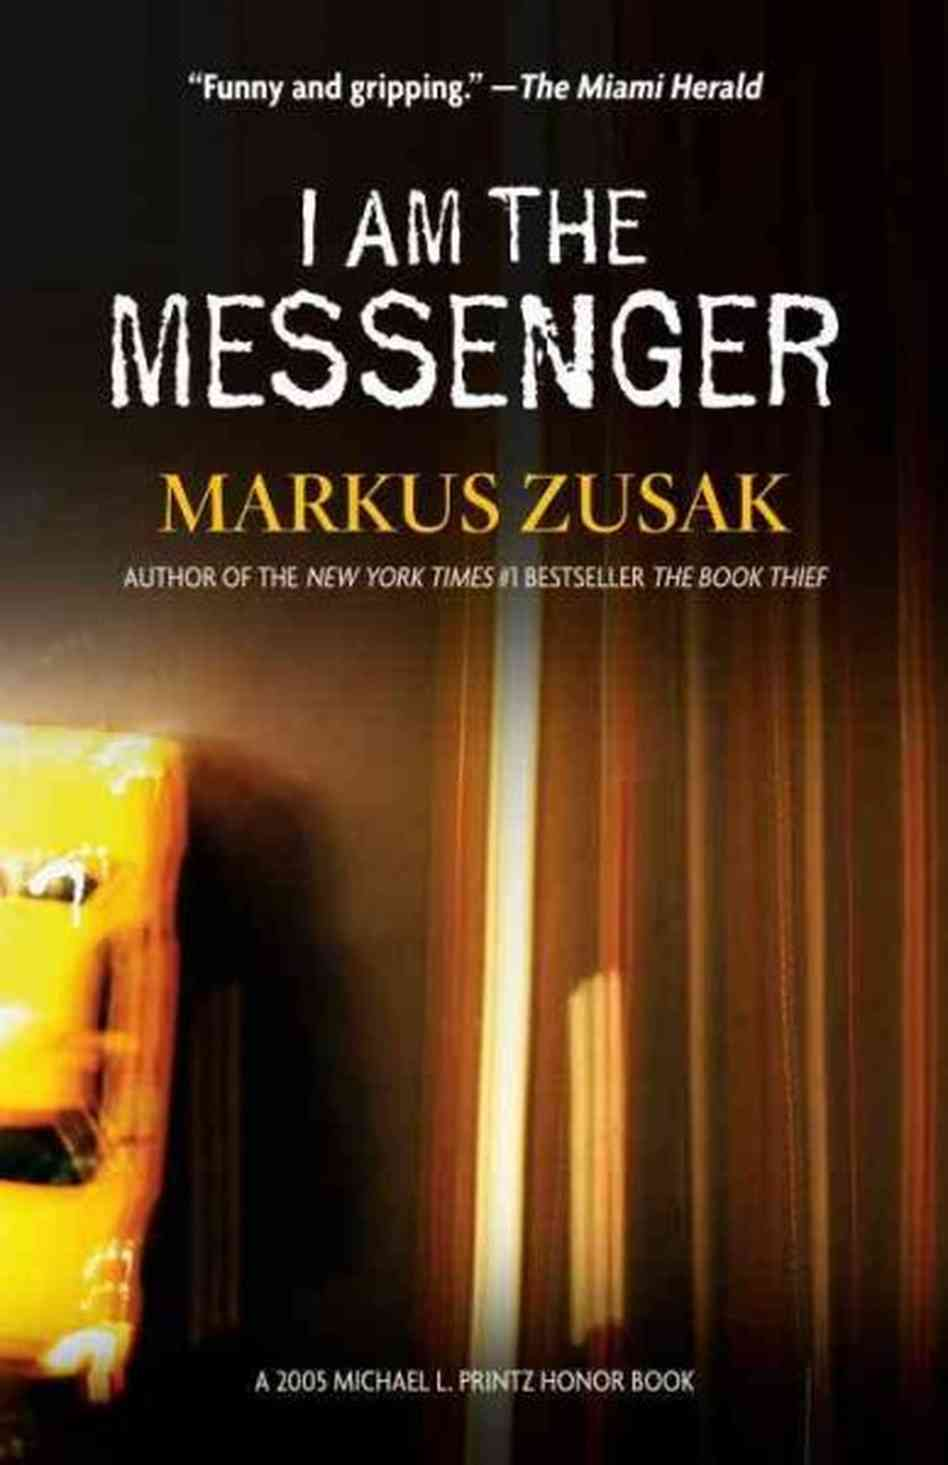 I am the Messenger by Markus Zusak | Reviewed on Clear Eyes, Full Shelves